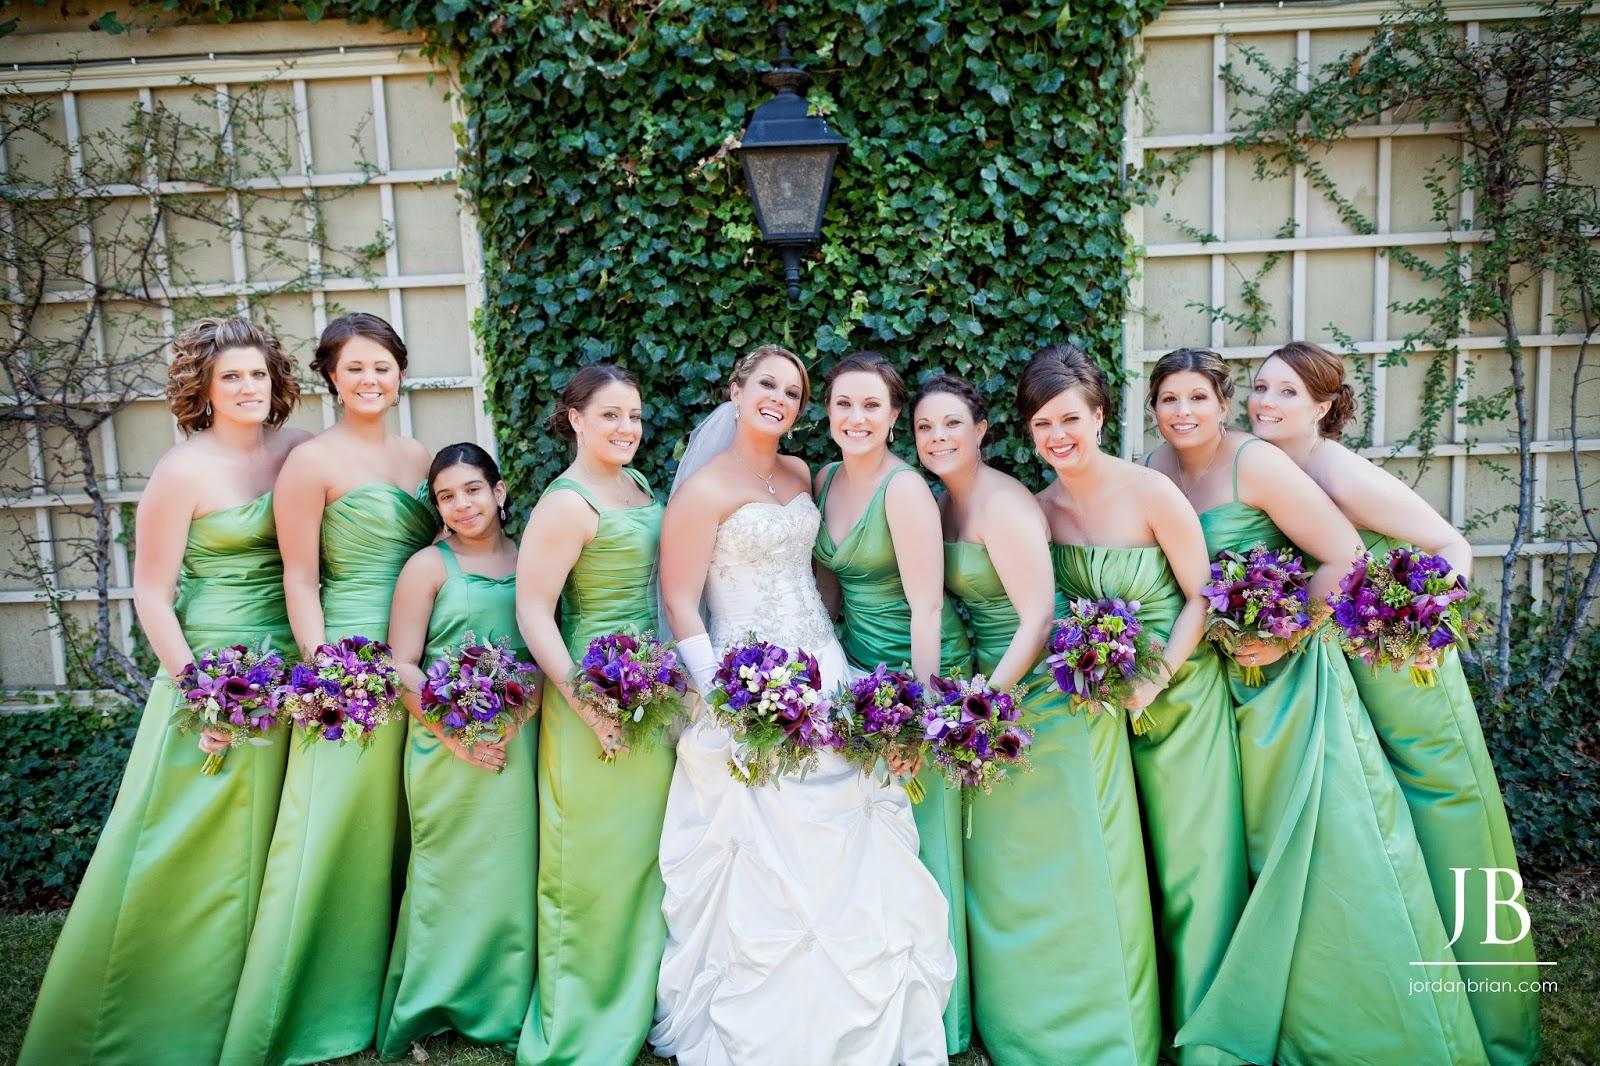 The enchanted petal purple green wedding delight purple green wedding delight junglespirit Choice Image